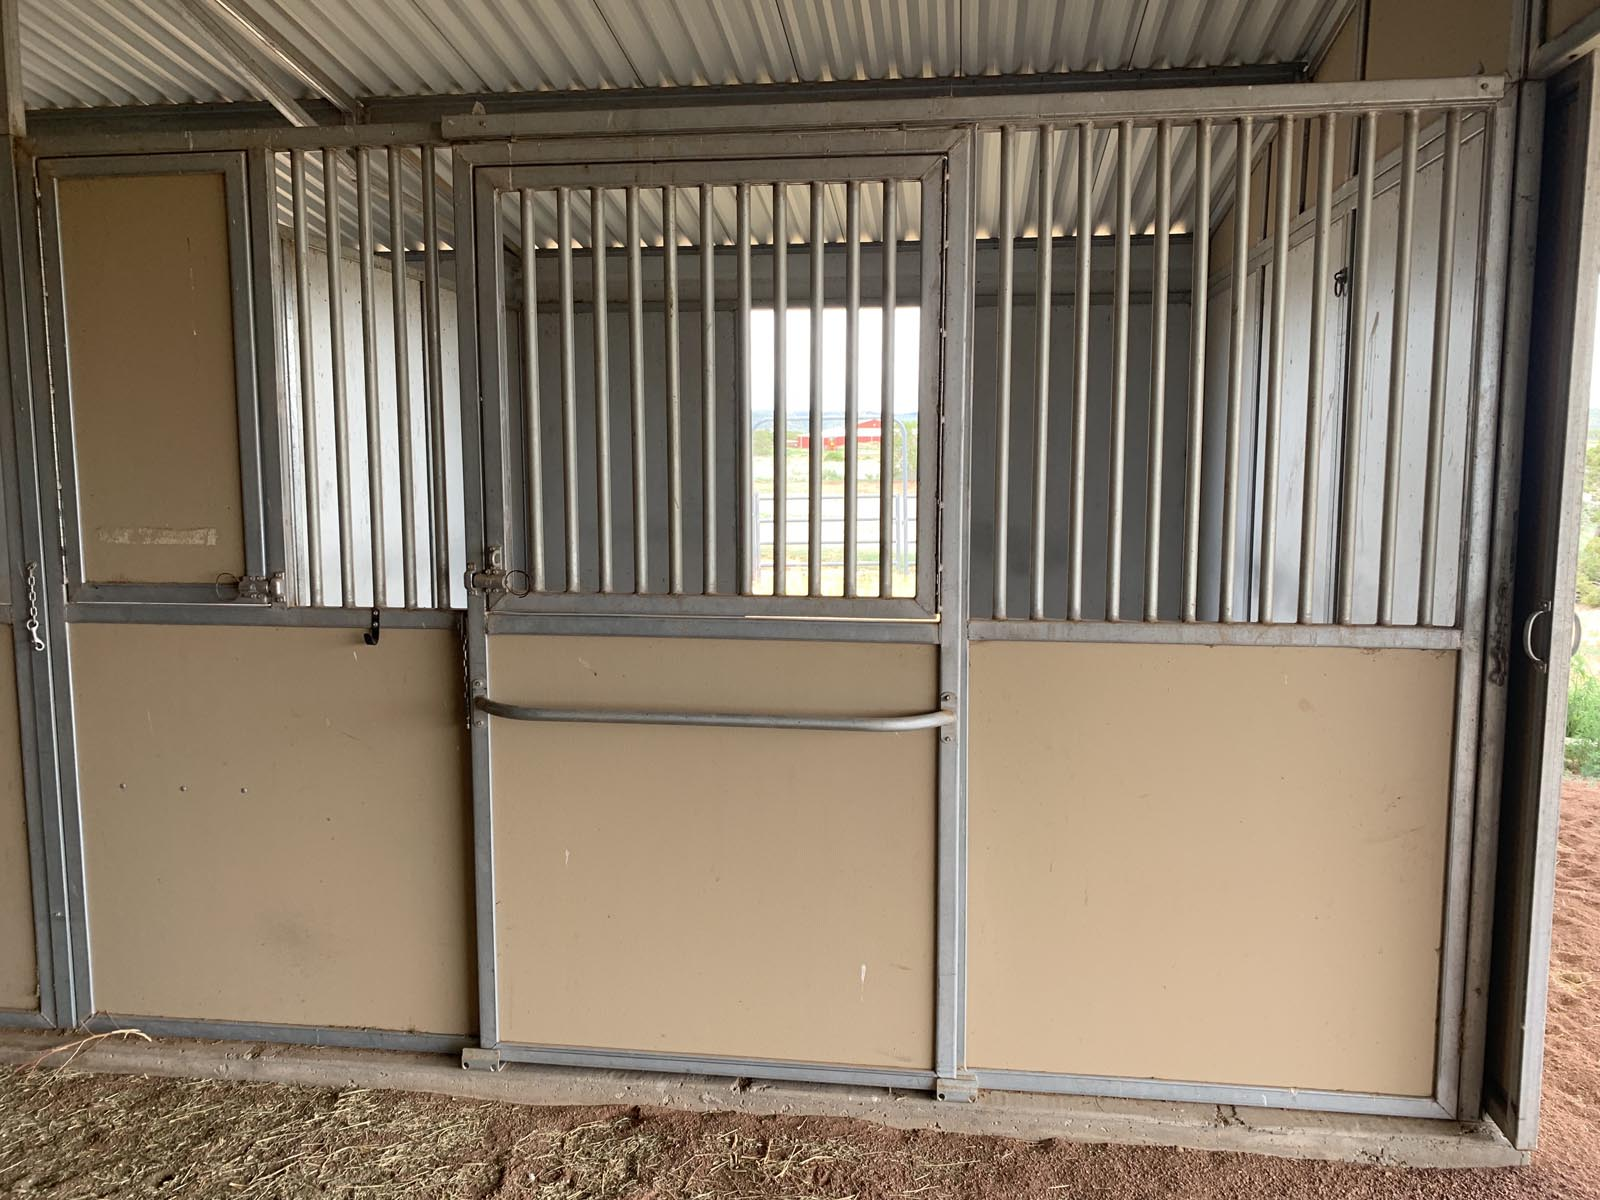 Stall at Tiger Owl Ranch horse boarding facility in Santa Fe, New Mexico